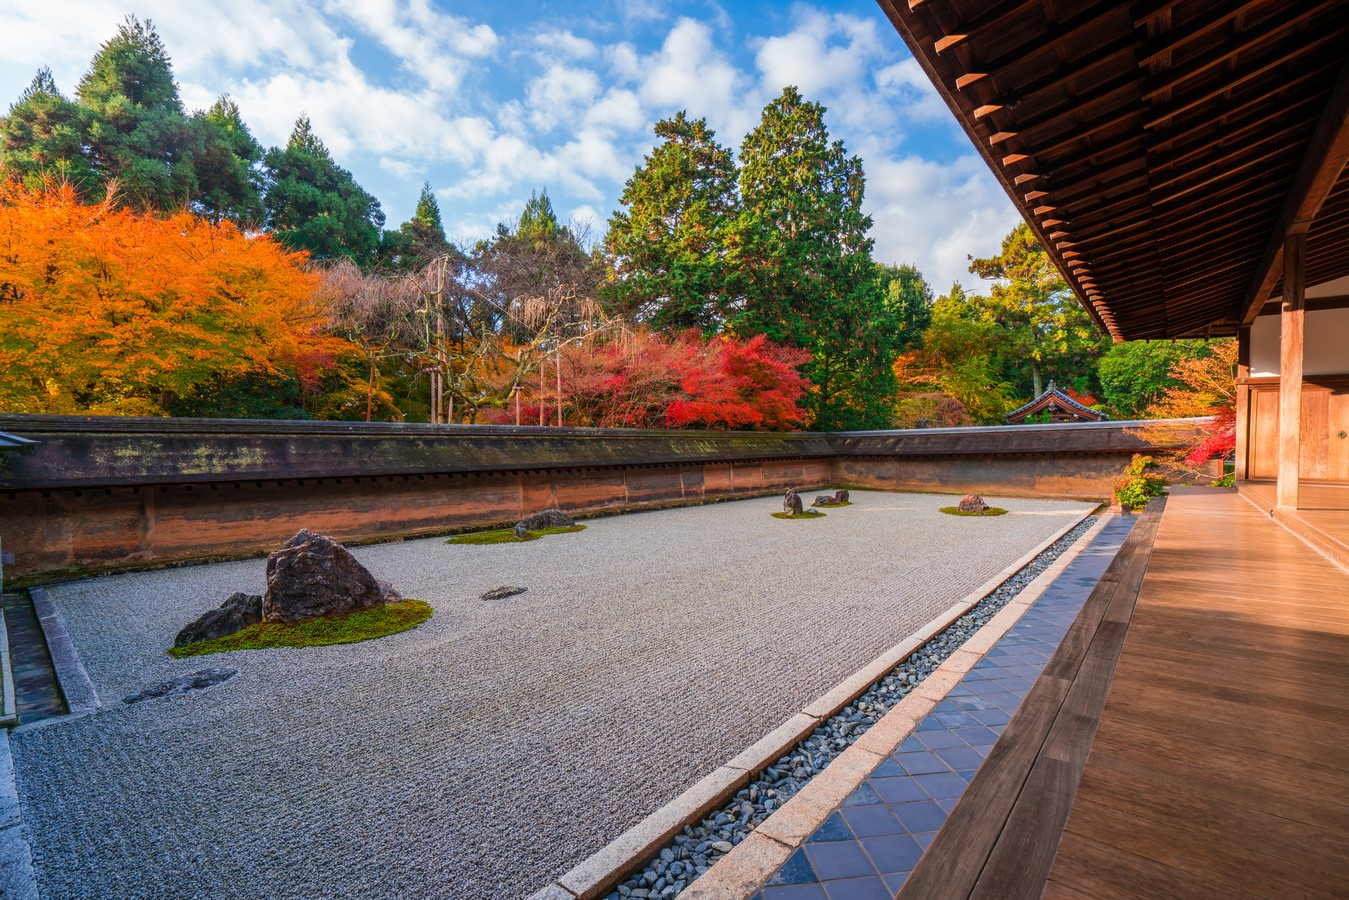 Karesansui Dry Garden-Ryoanji Temple - Sheet1